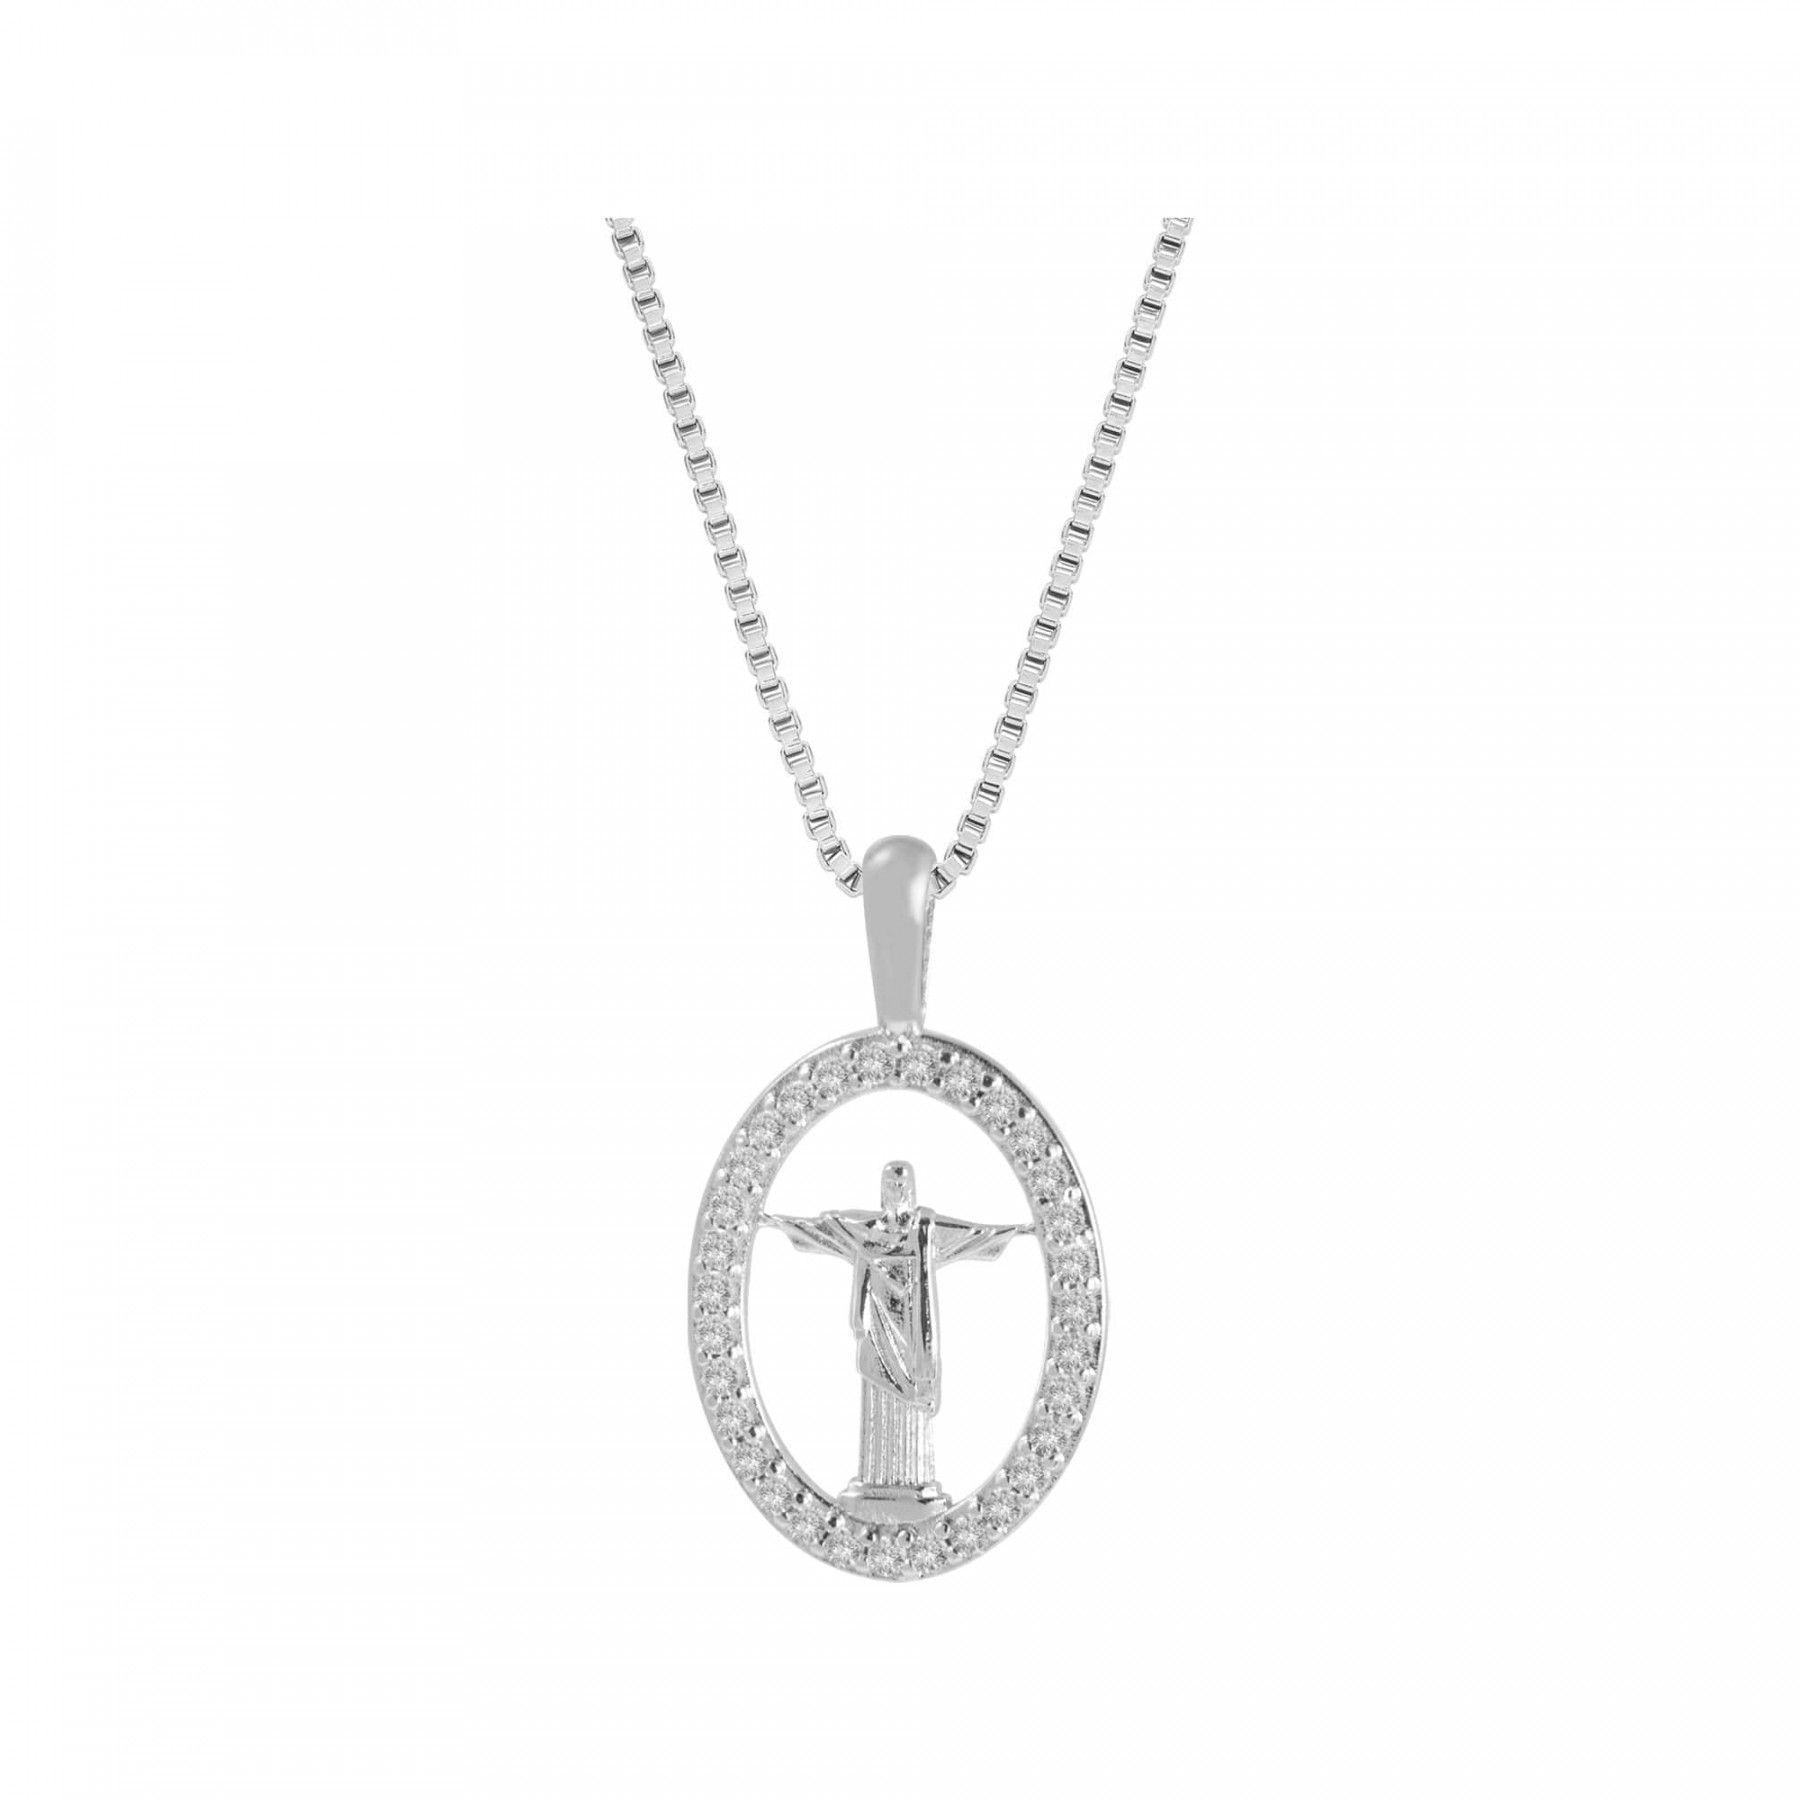 Colar de Prata Pingente Cristo Redentor 3419945